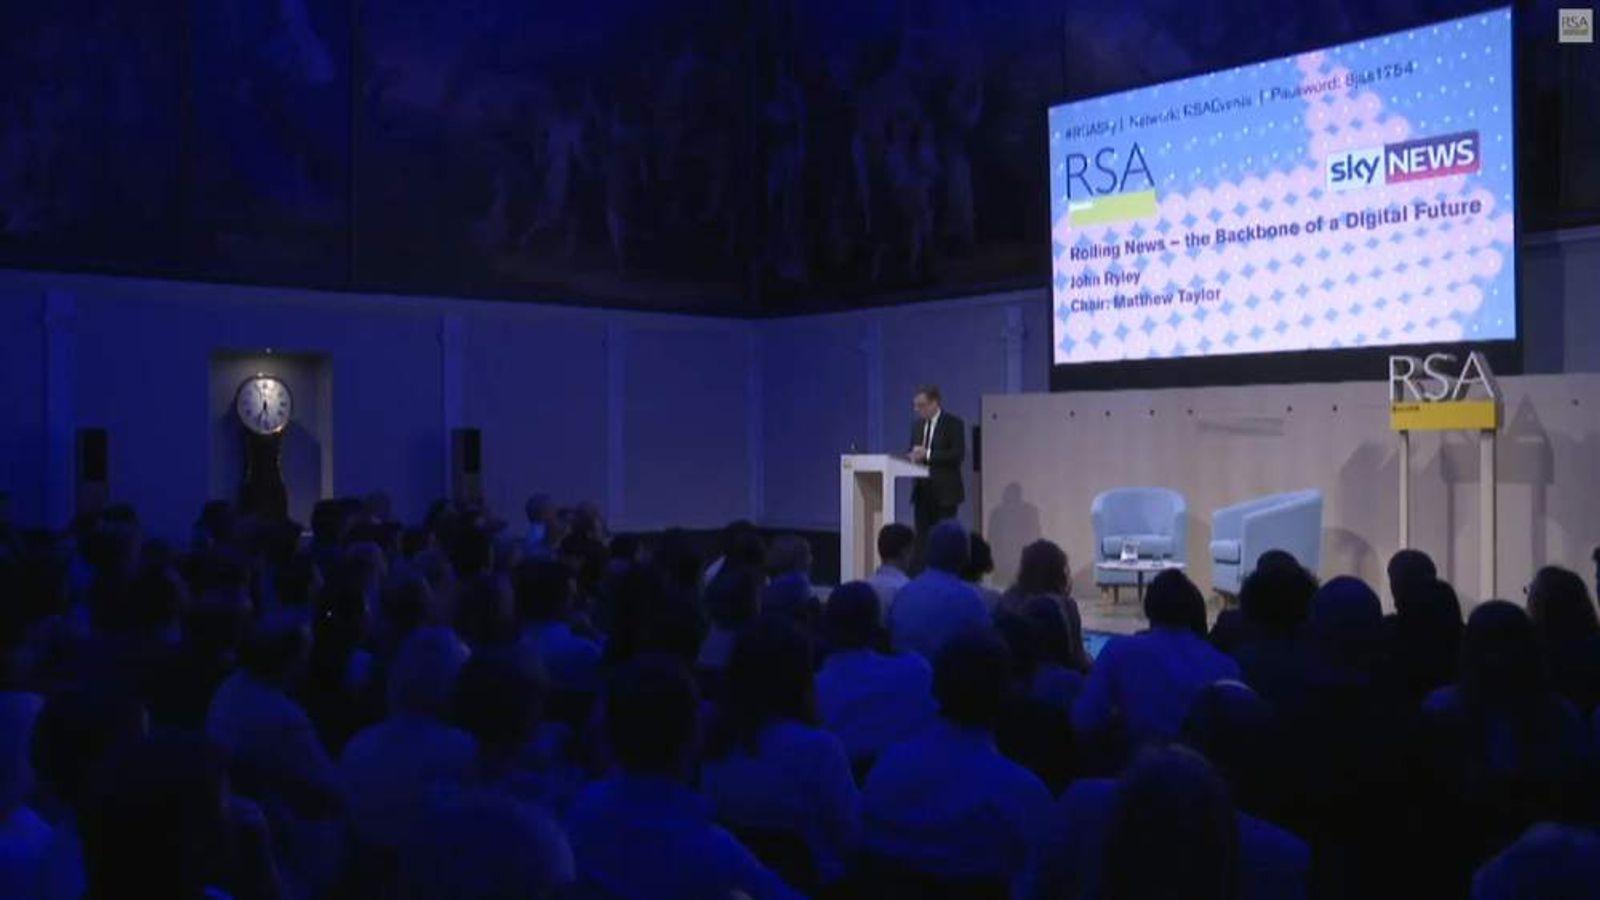 Sky News John Ryley speech